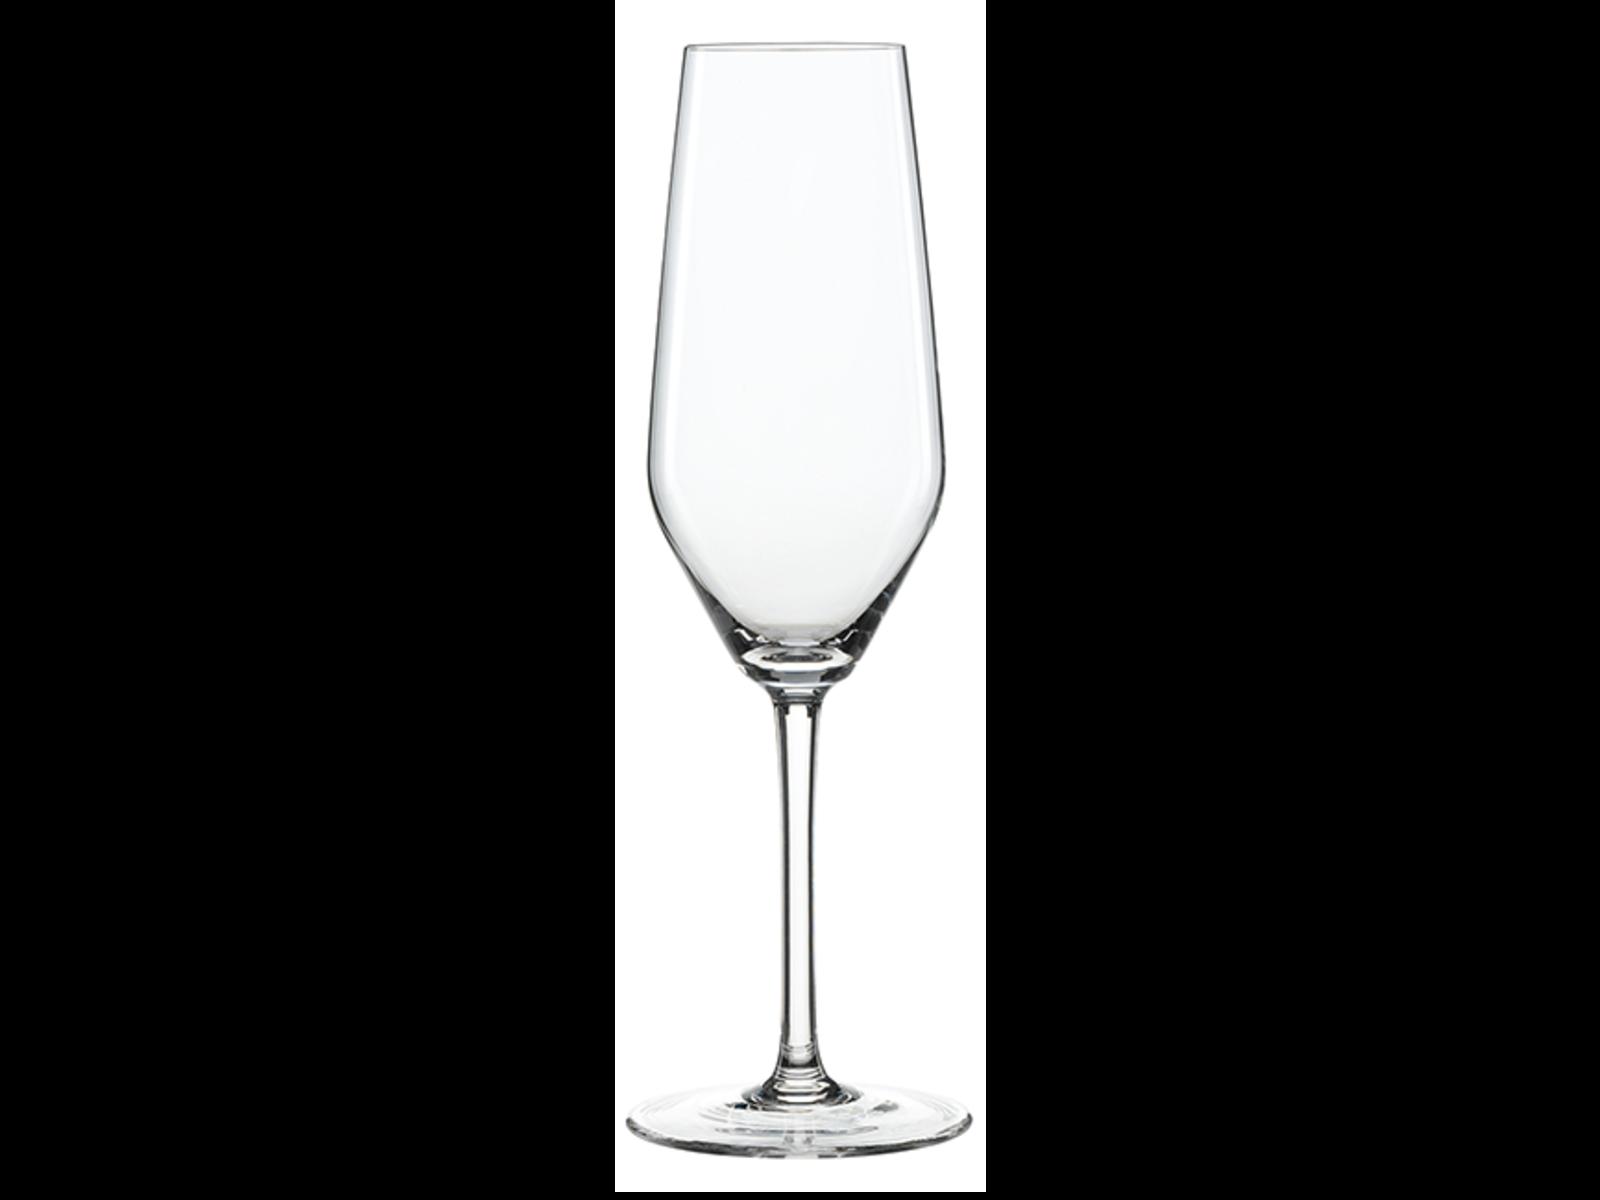 Spiegelau Spiegelau Glas Champagne 240 ml